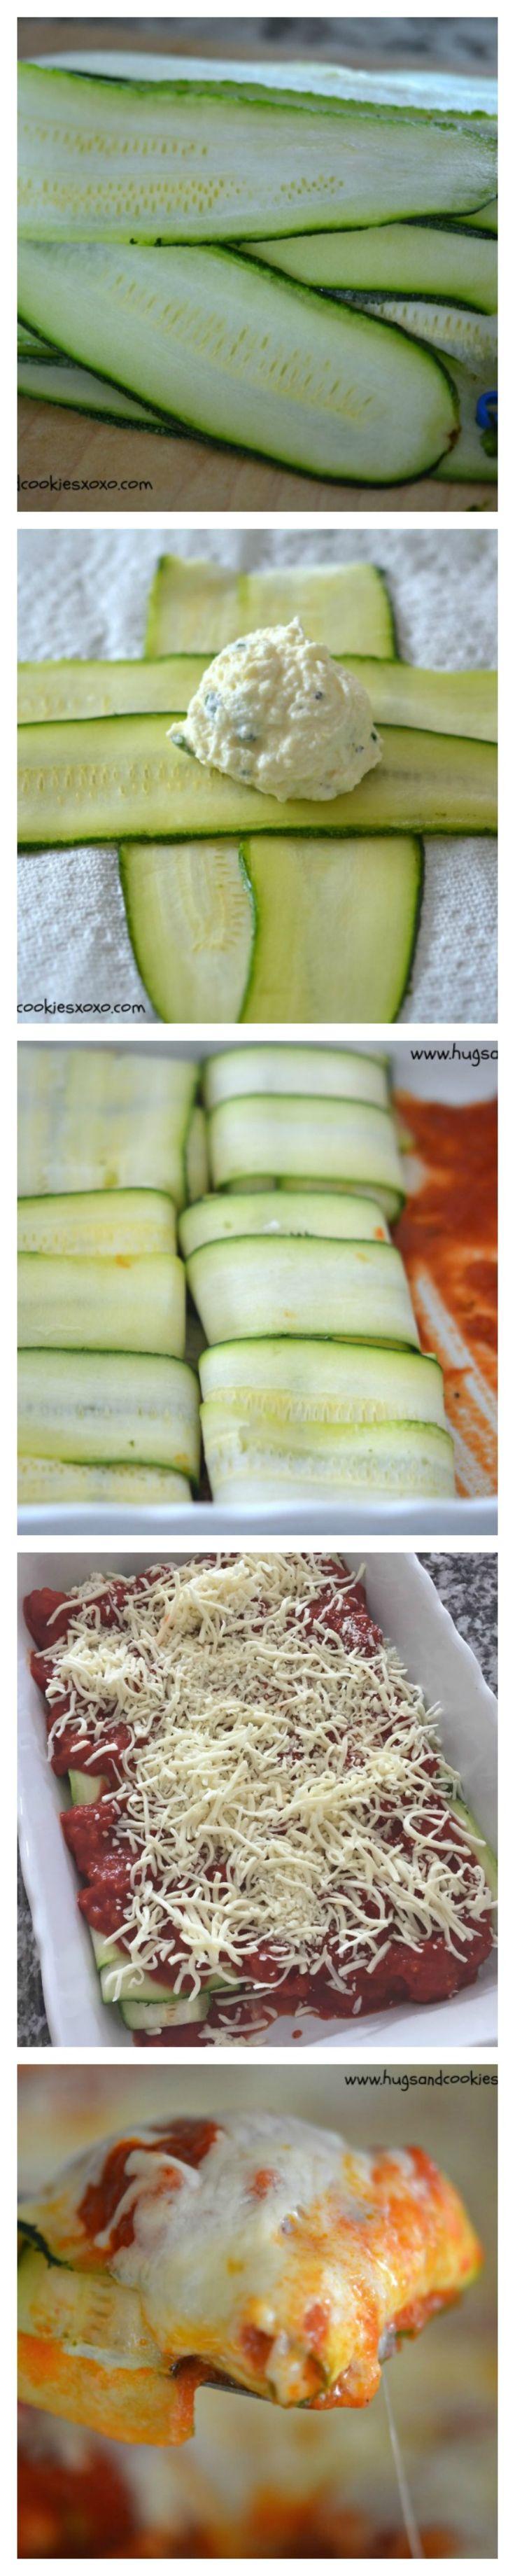 Zucchini ravioli. Not vegan, but wants to be, using tofu ricotta and non-dairy cheese.